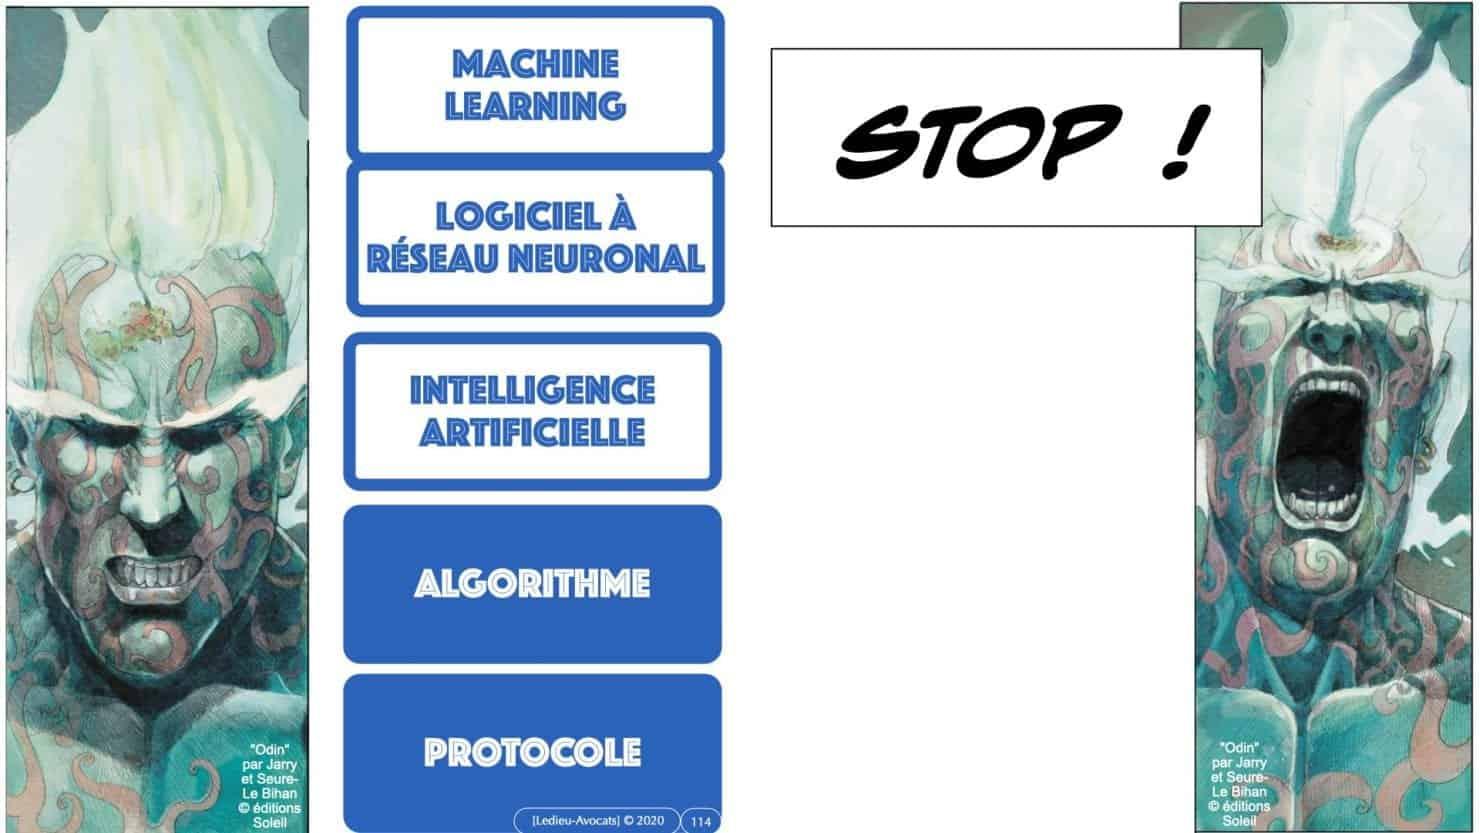 307 Intelligence artificielle-machine-learning-deep-learning-base de données-BIG-DATA *16:9* Constellation ©Ledieu-Avocat-13-10-2020.114